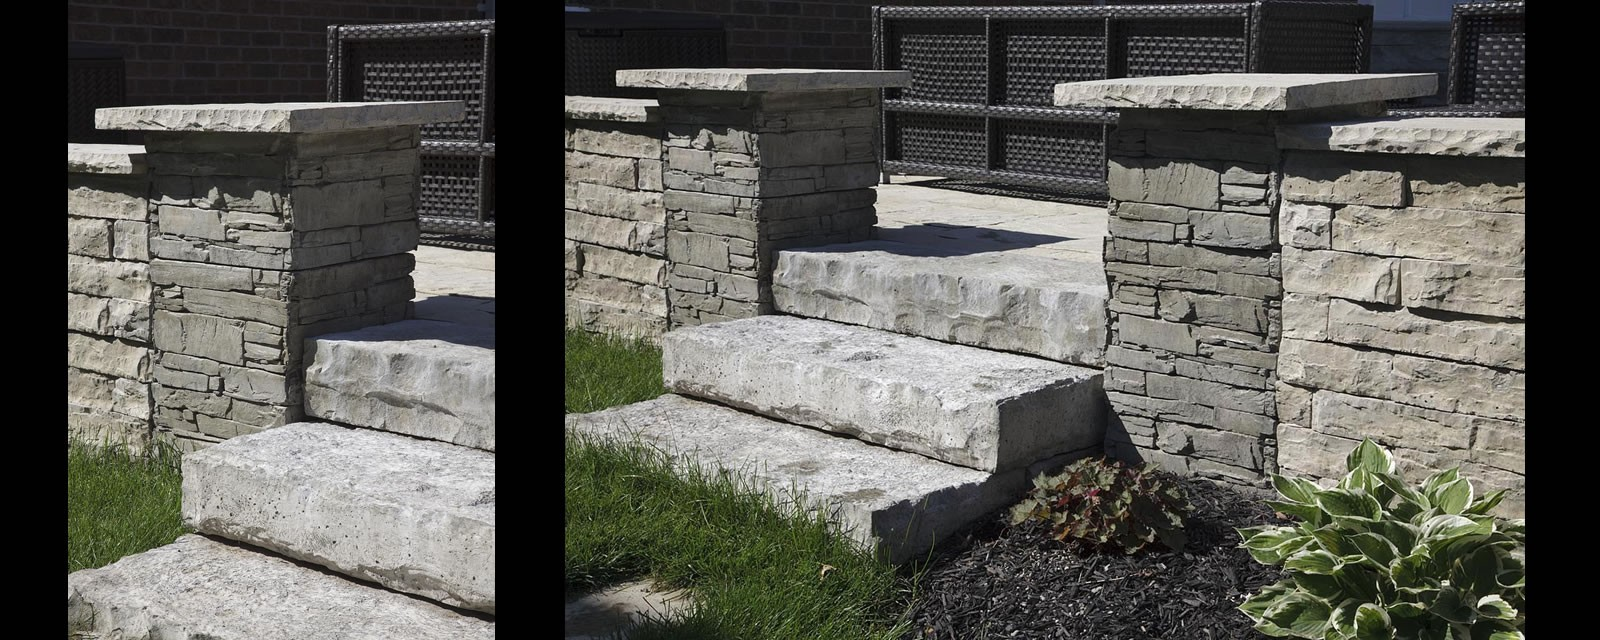 Limestone's That Possess Quality